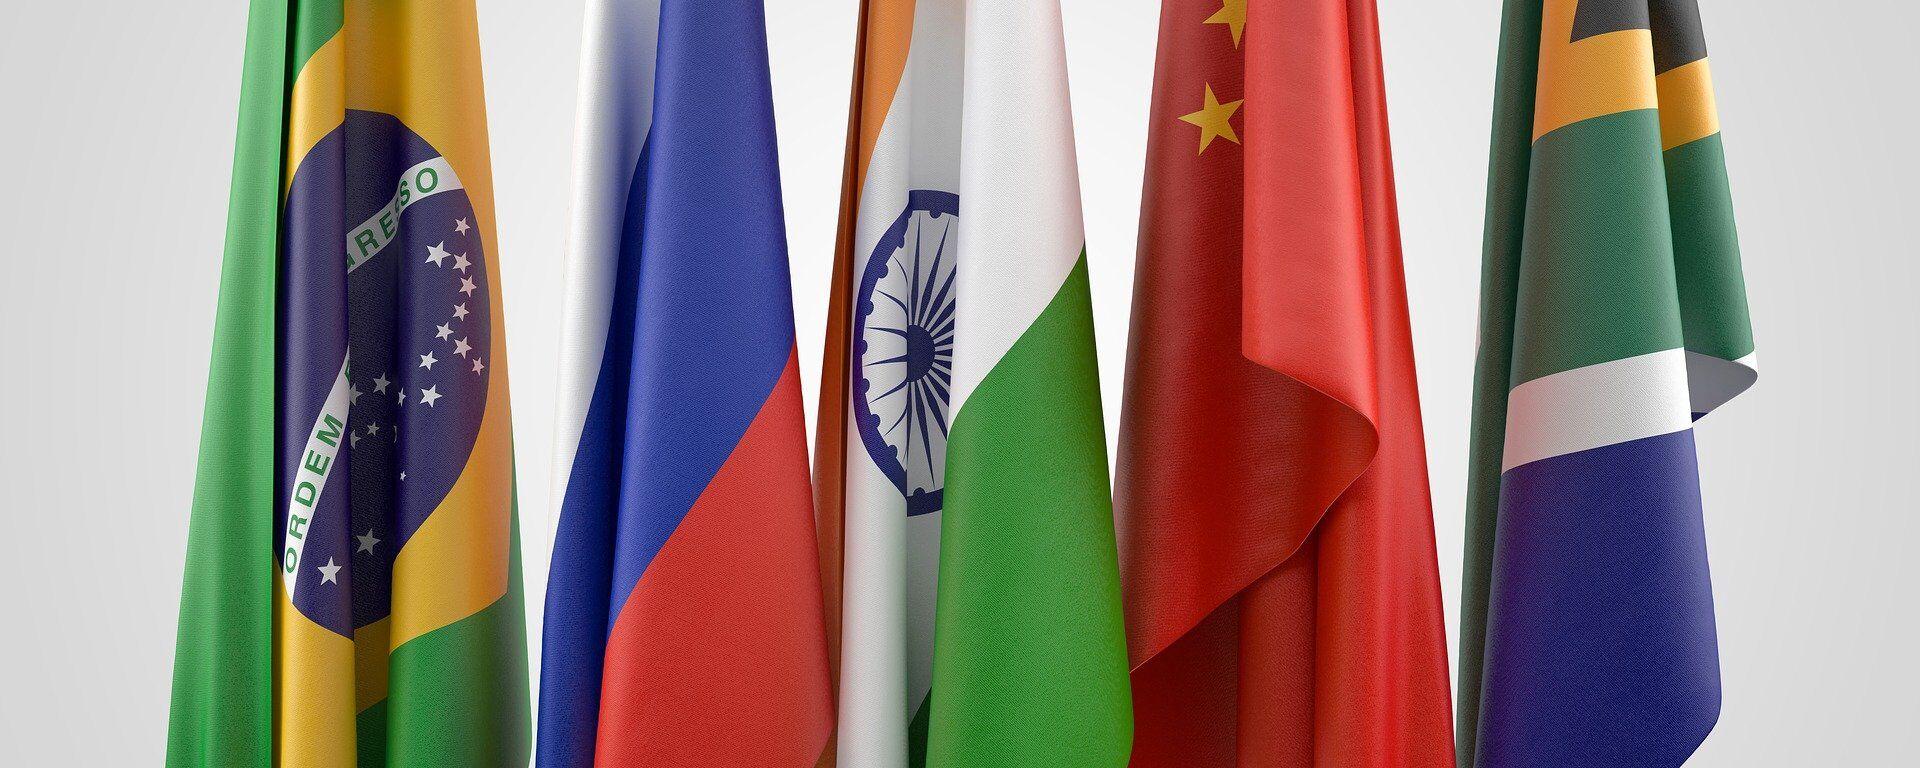 Banderas de los países BRICS: Brasil, Rusia, India, China y Sudáfrica - Sputnik Mundo, 1920, 07.09.2021